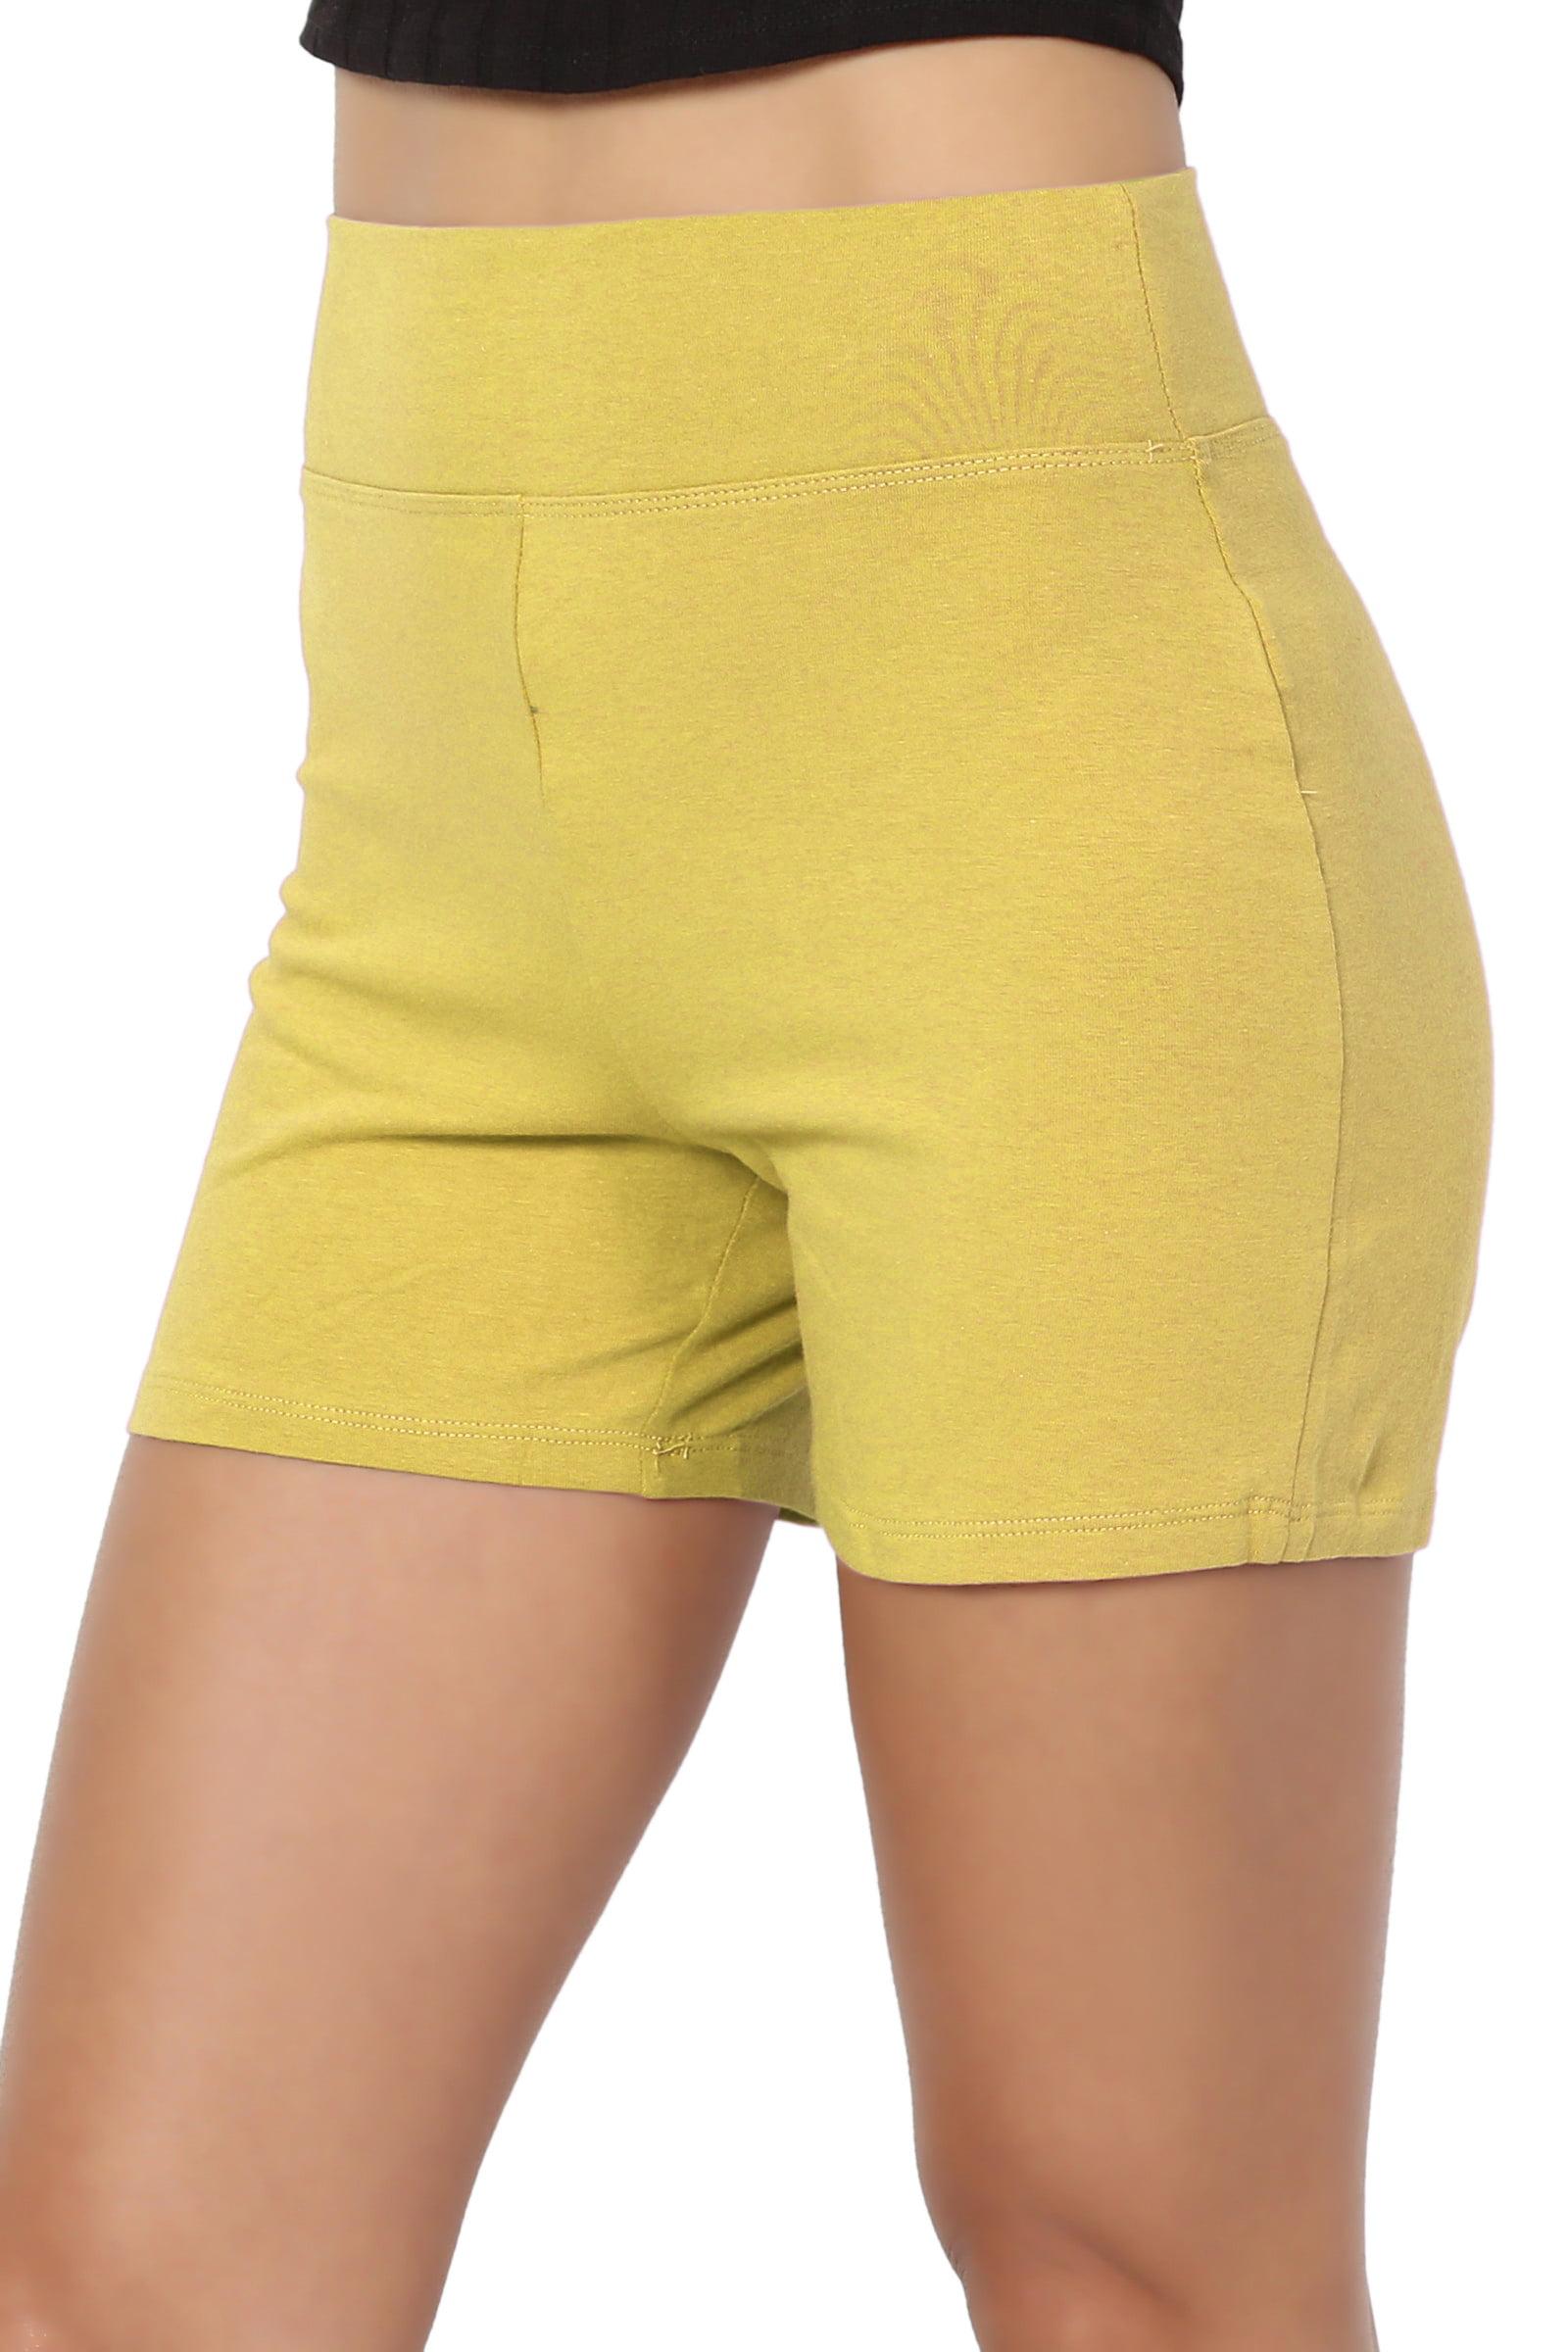 TheMogan Women's S~3XL Cotton Spandex High Waisted Under Short Bike Yoga Leggings